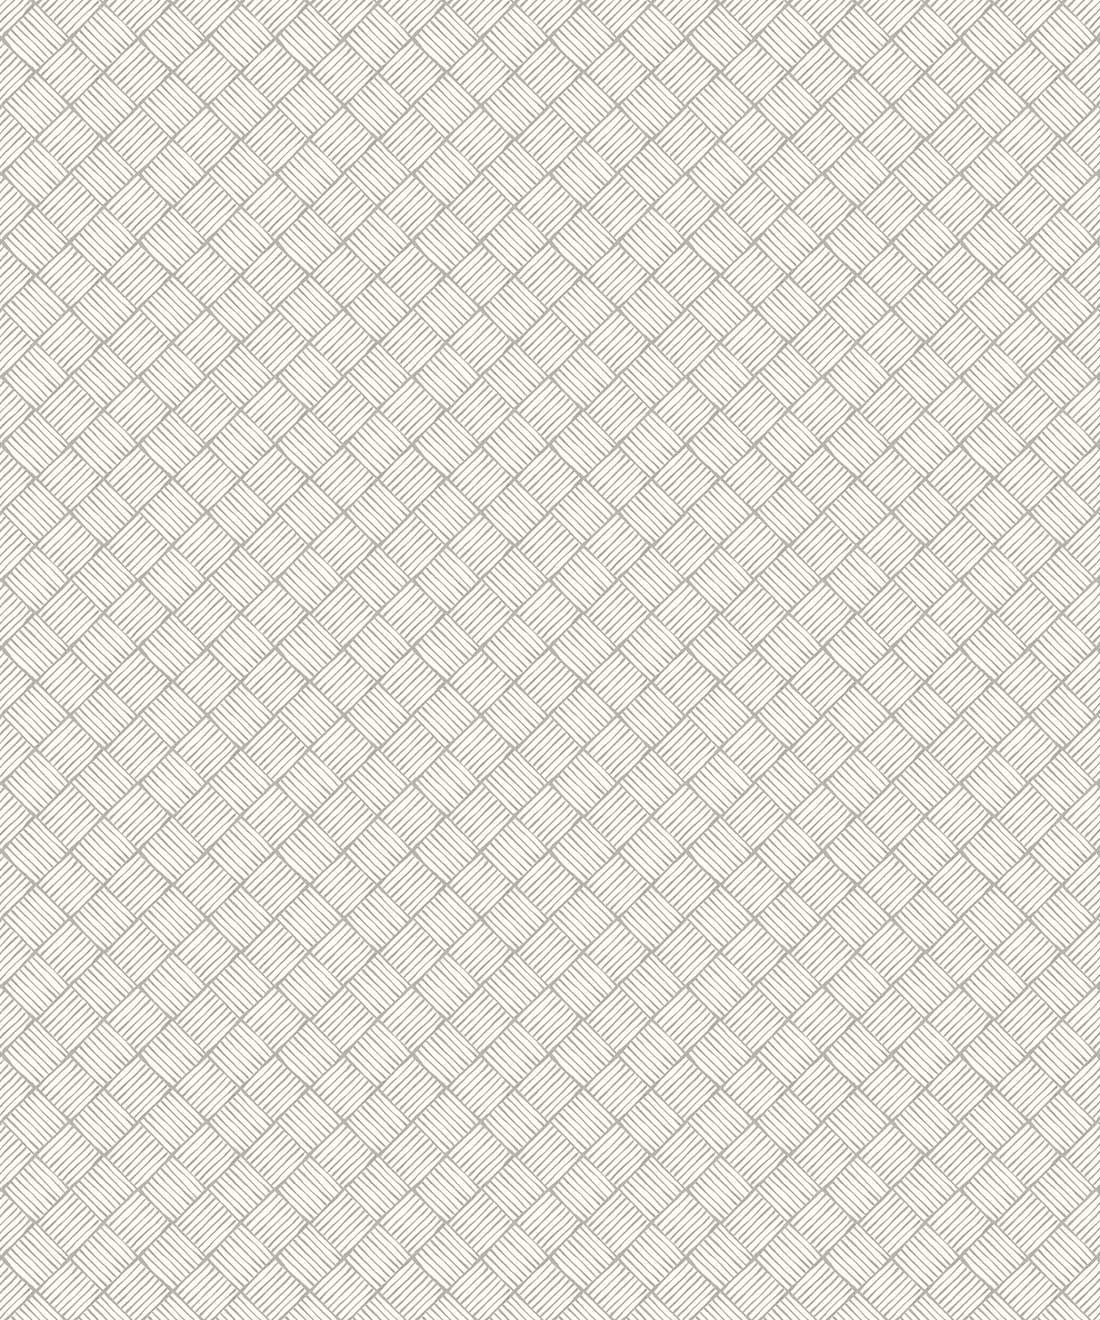 Thompson Wallpaper